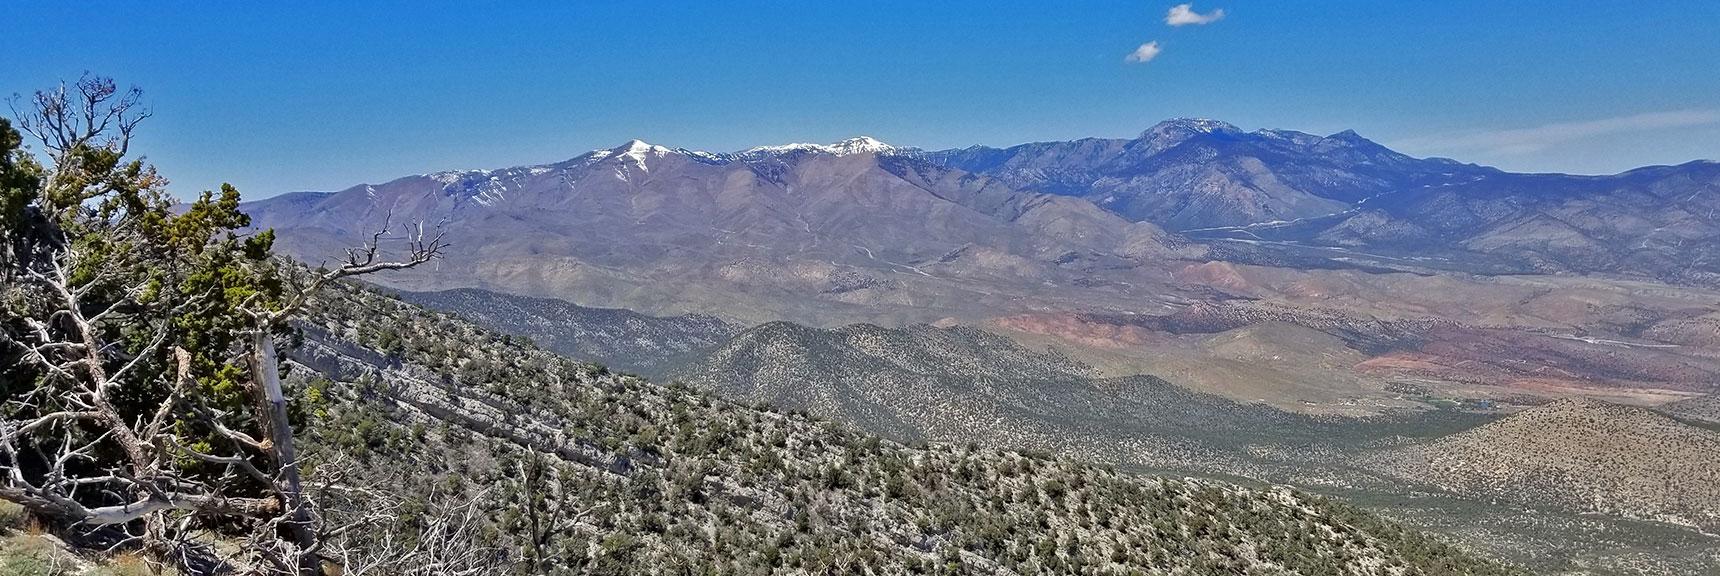 Mt Charleston Wilderness Viewed from Keystone Thrust Just West of El Padre Mountain, La Madre Mountains Wilderness, Nevada